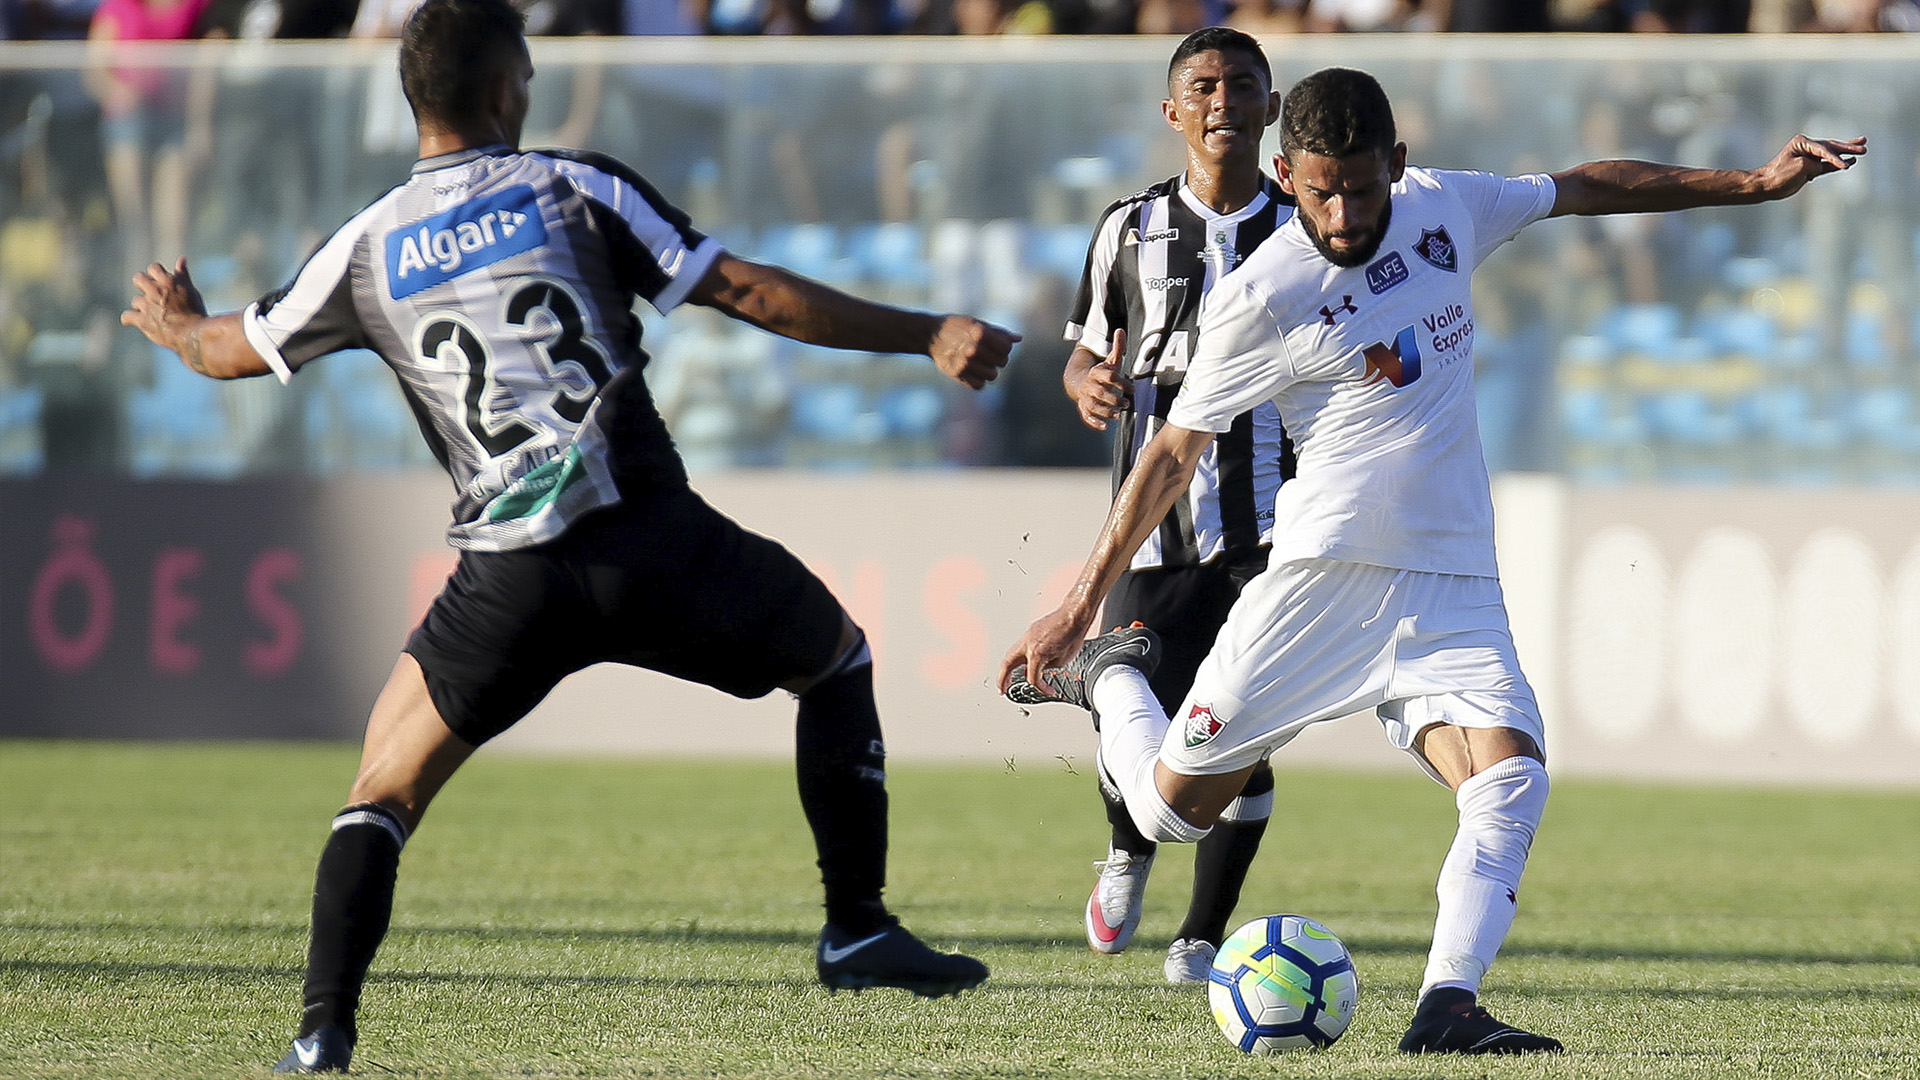 Jadson Fluminense x Ceará Brasileirão 28 07 18